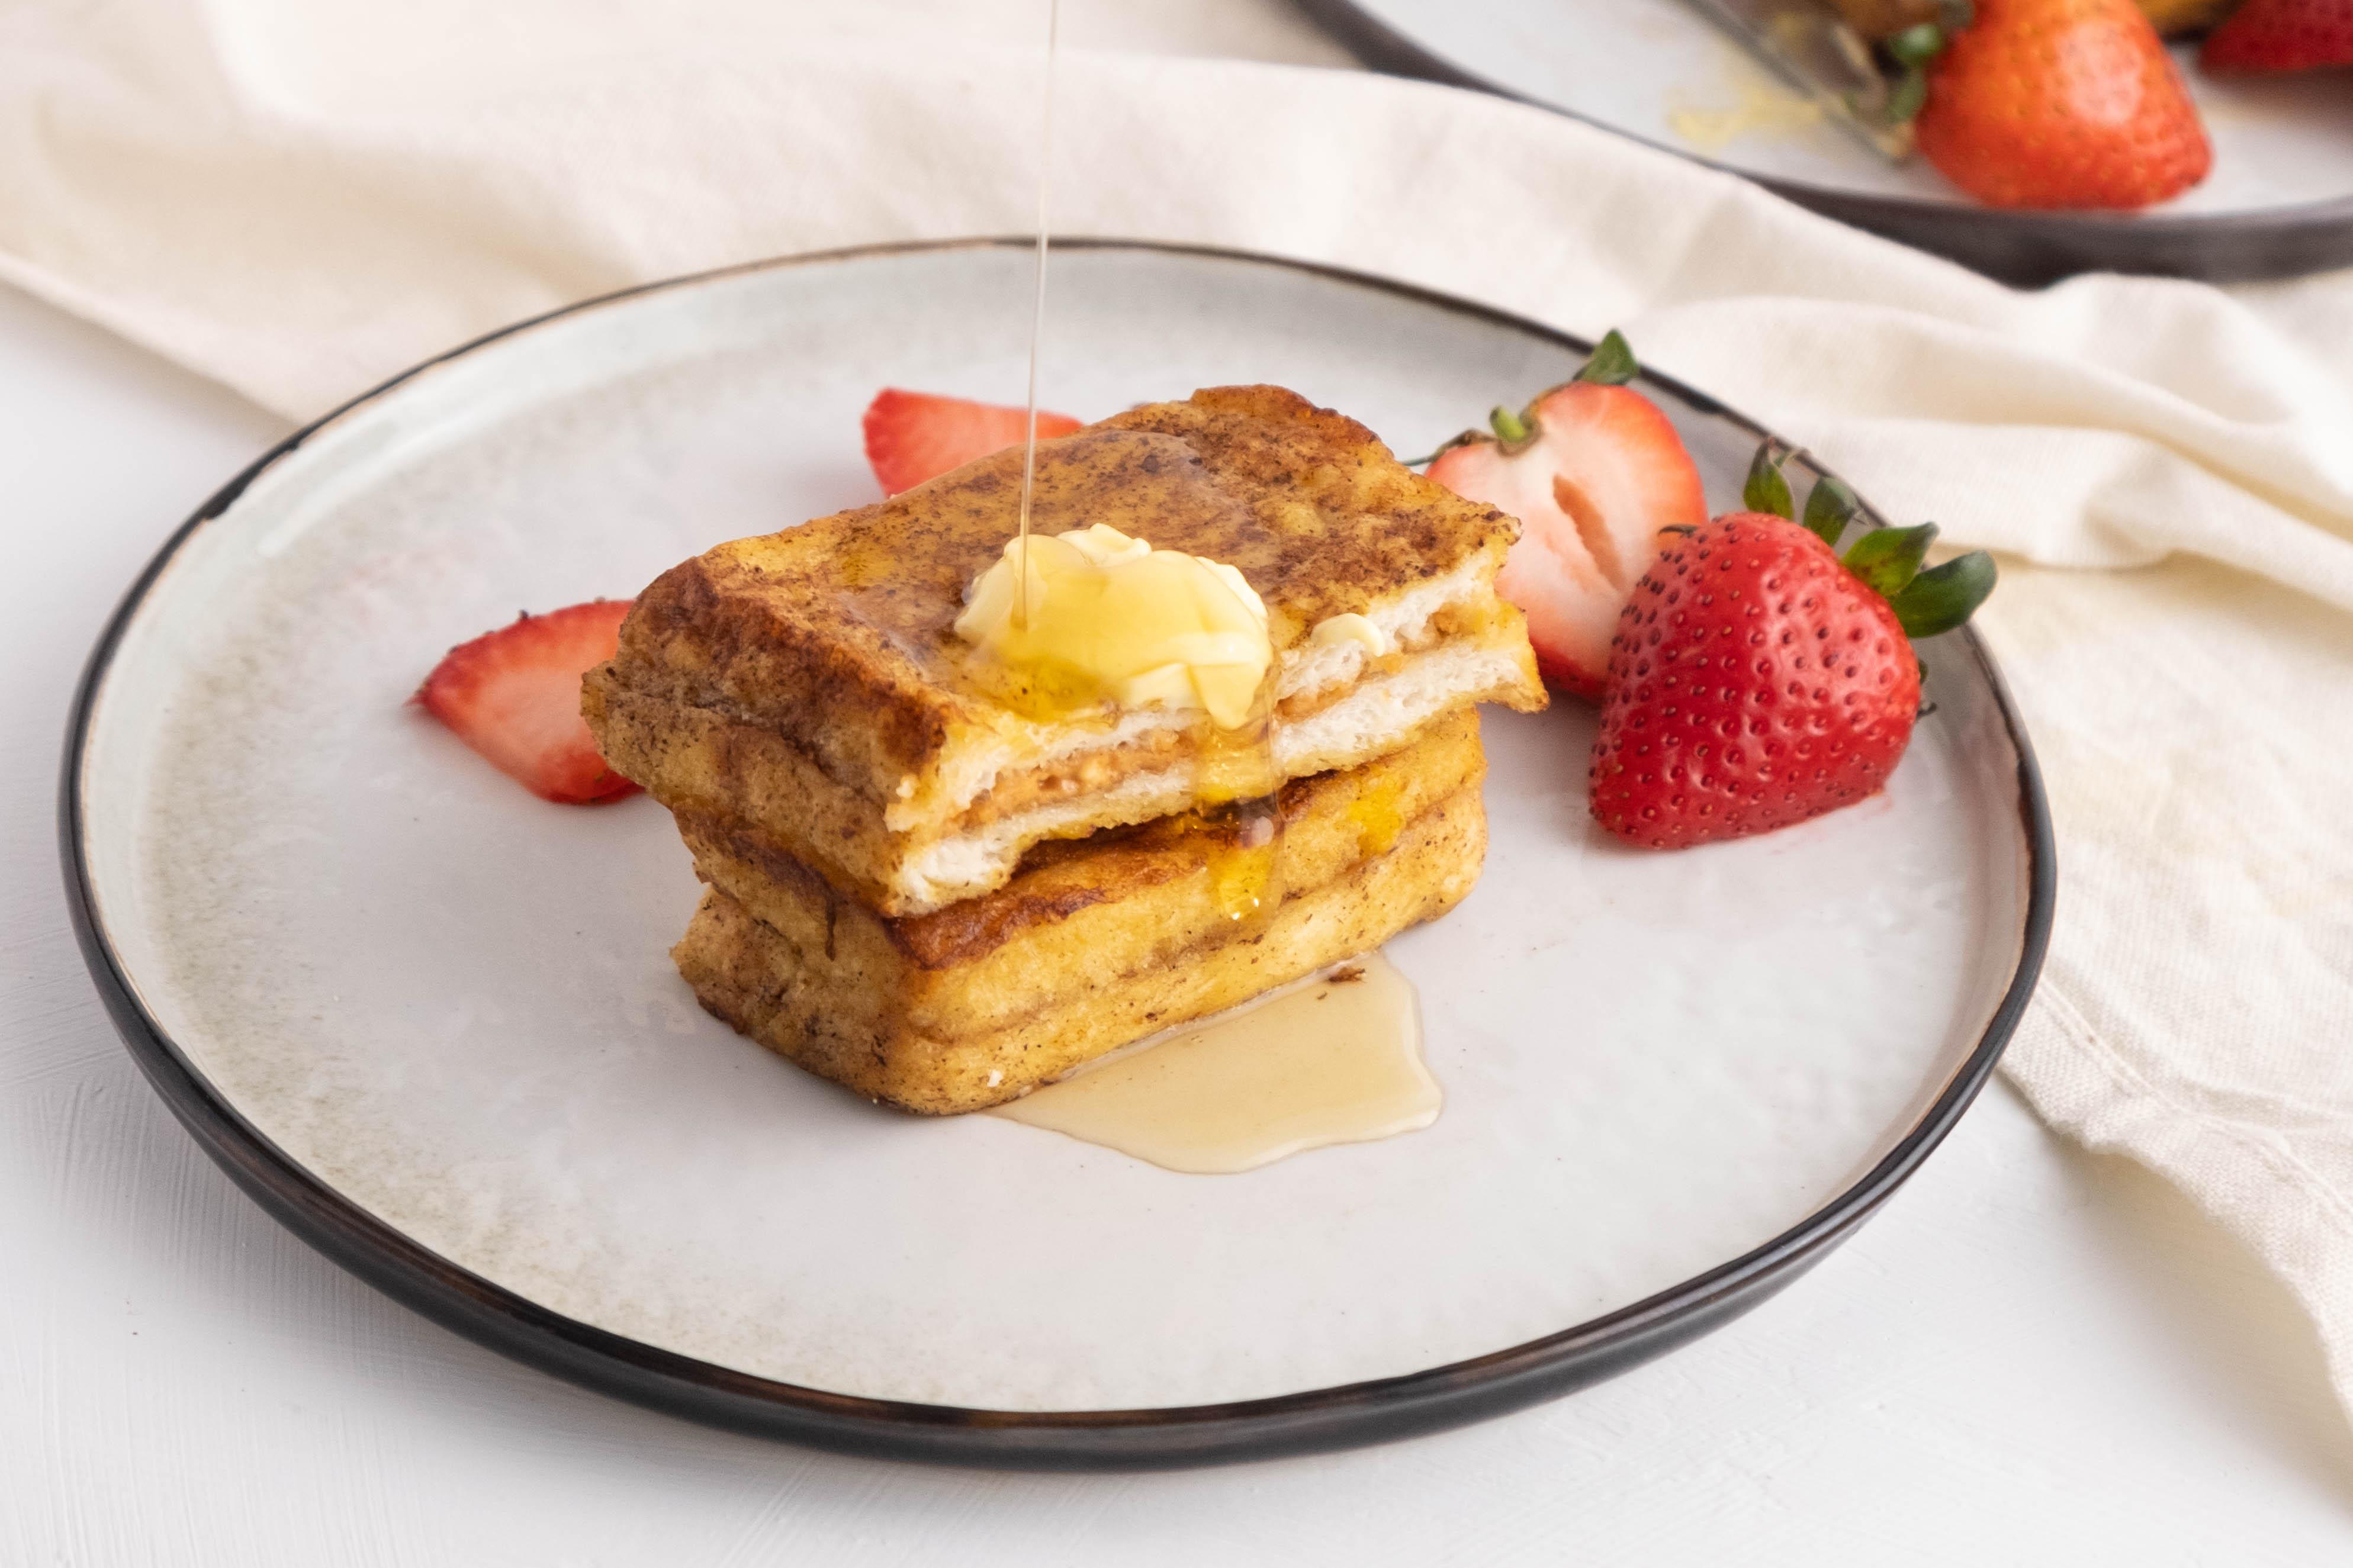 840x560-French-Toast